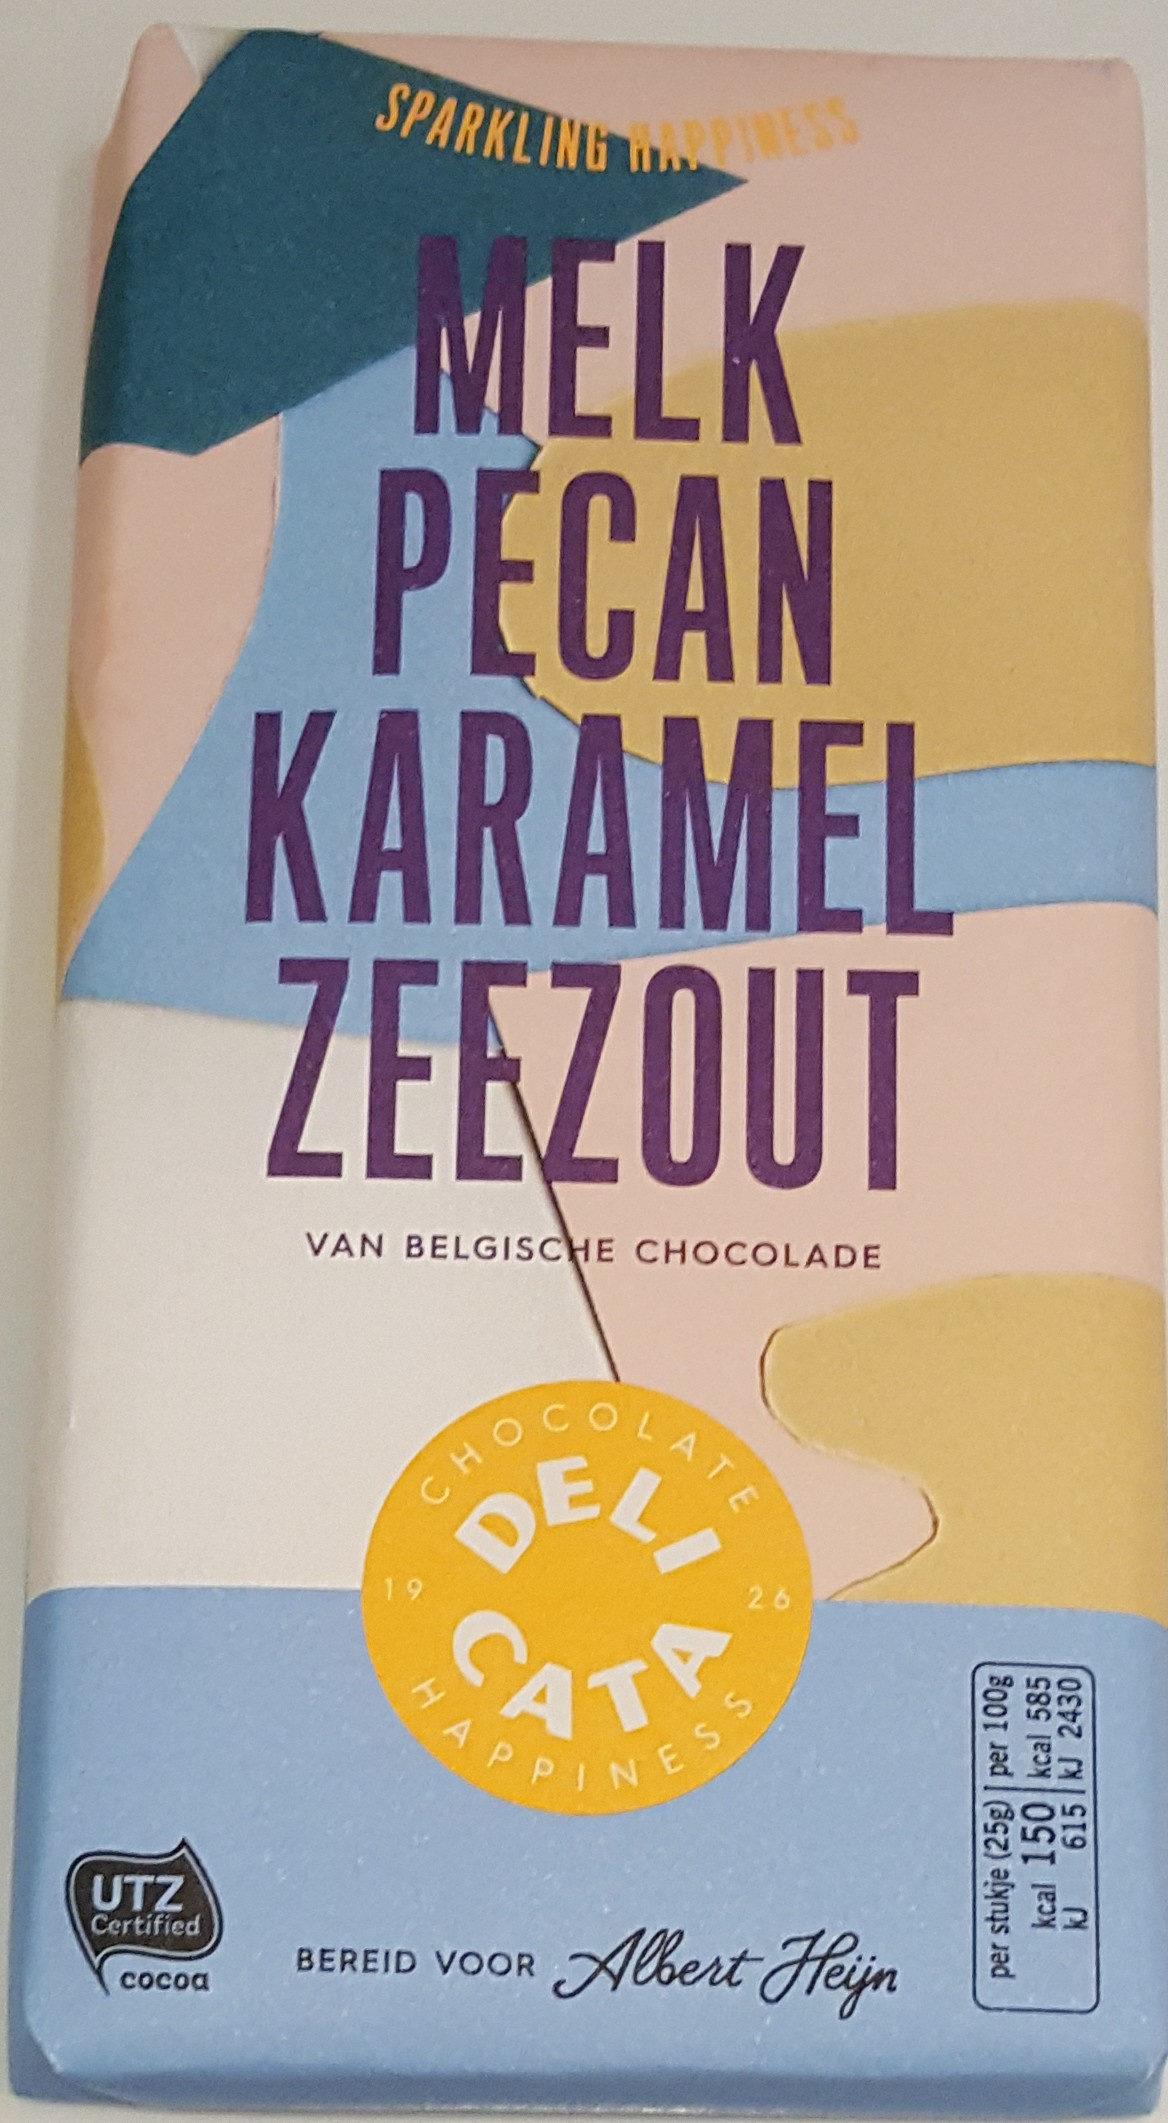 Melk pekan karamel zeezoul - Product